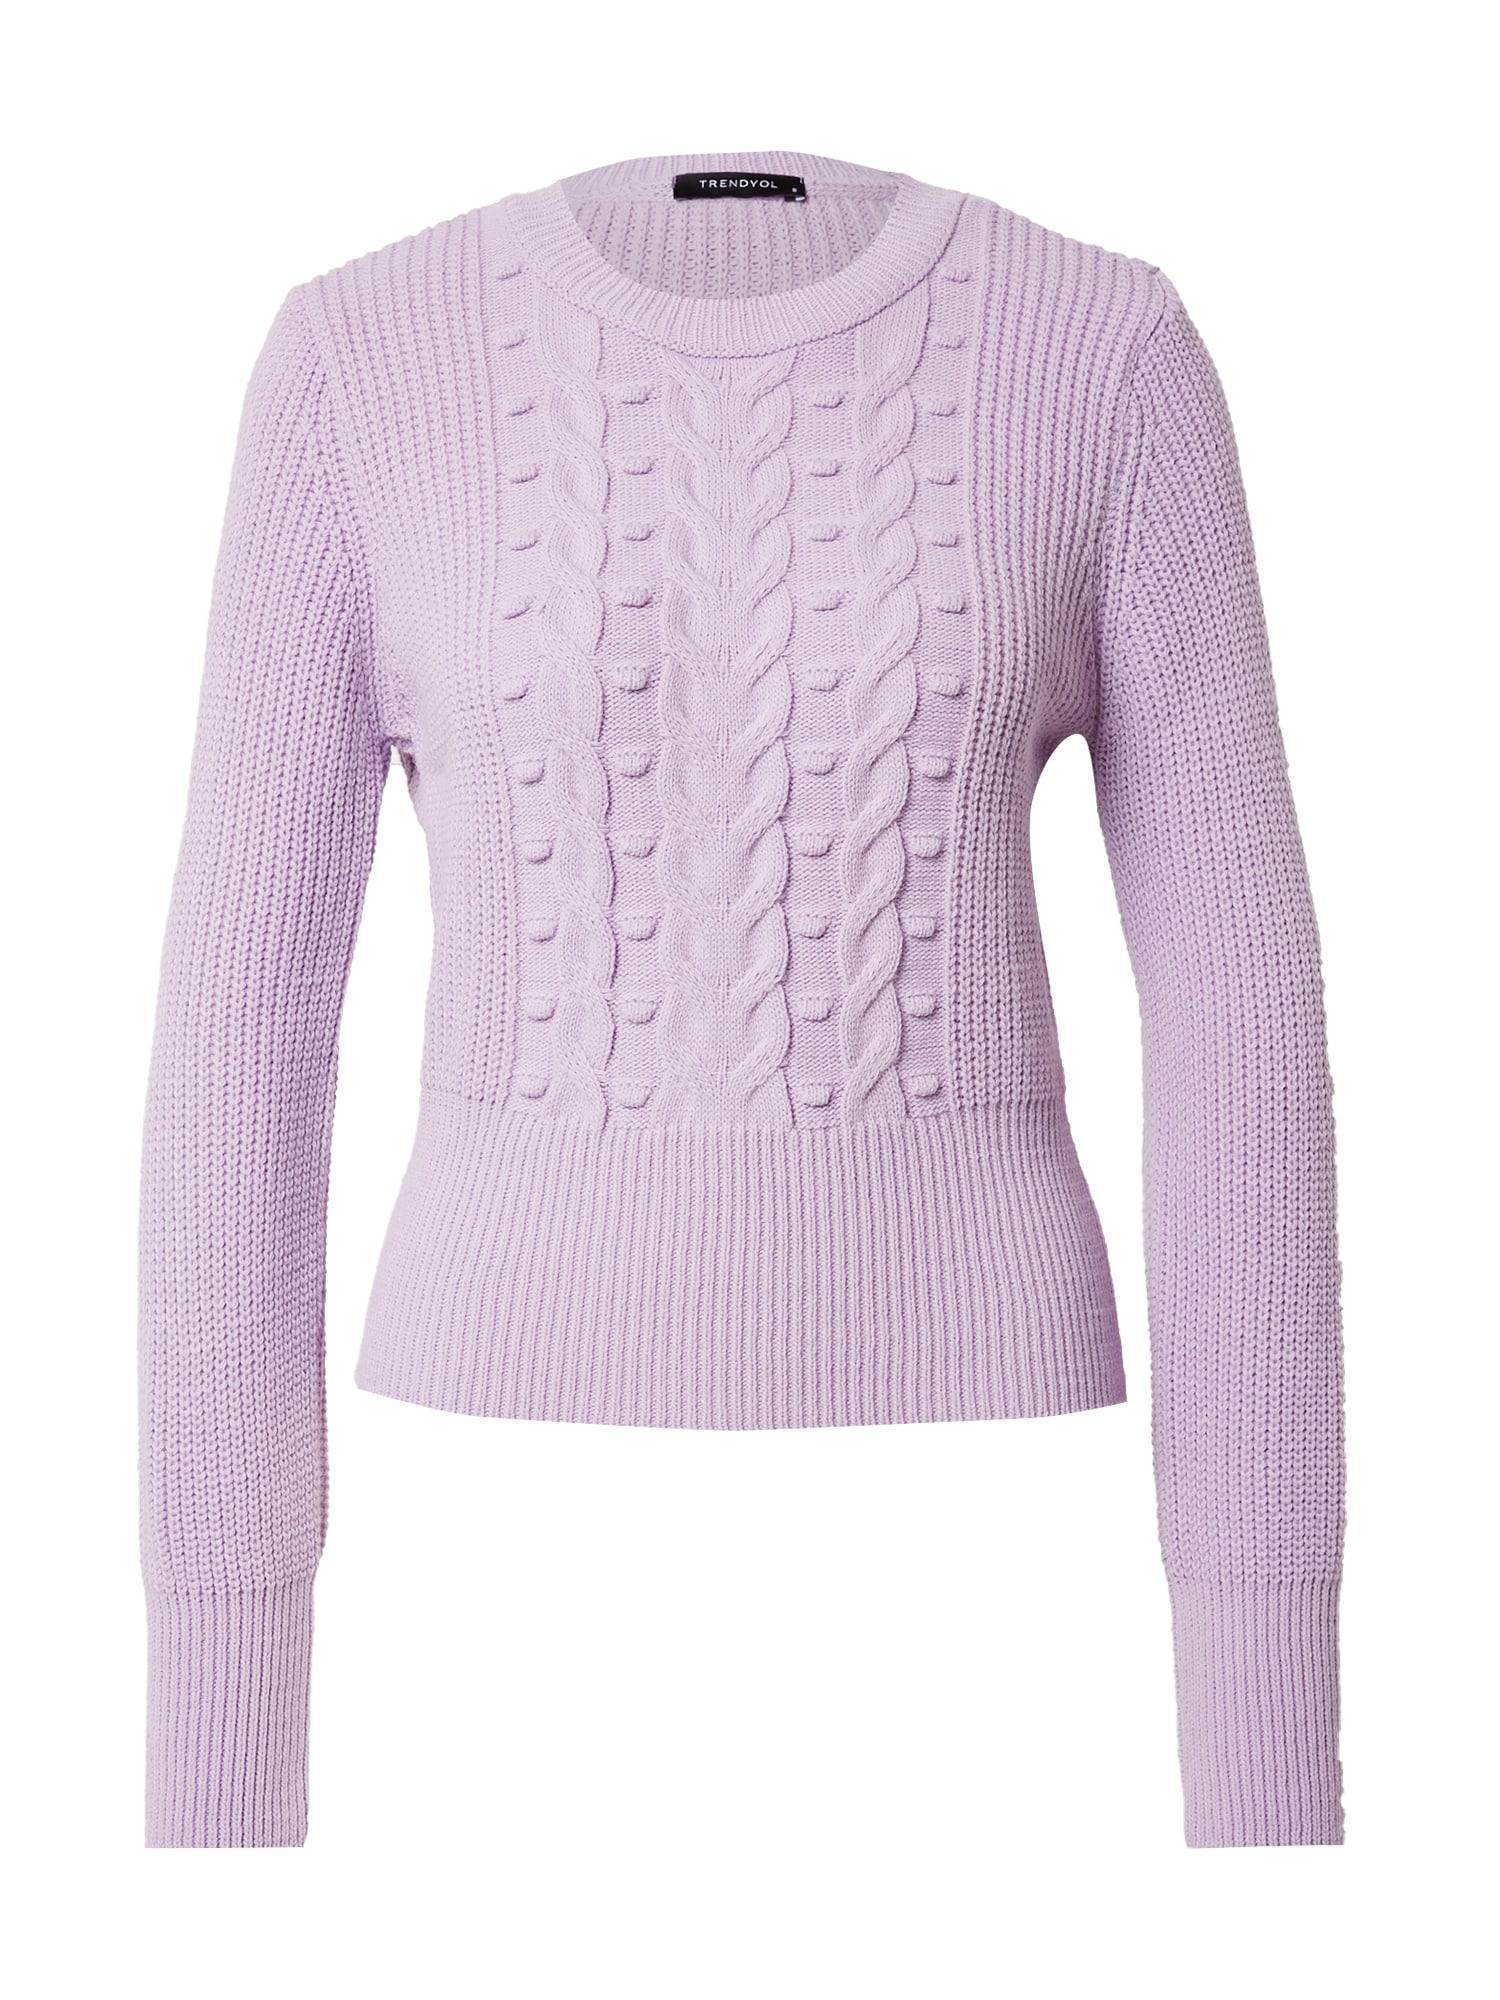 Trendyol Megztinis alyvinė spalva